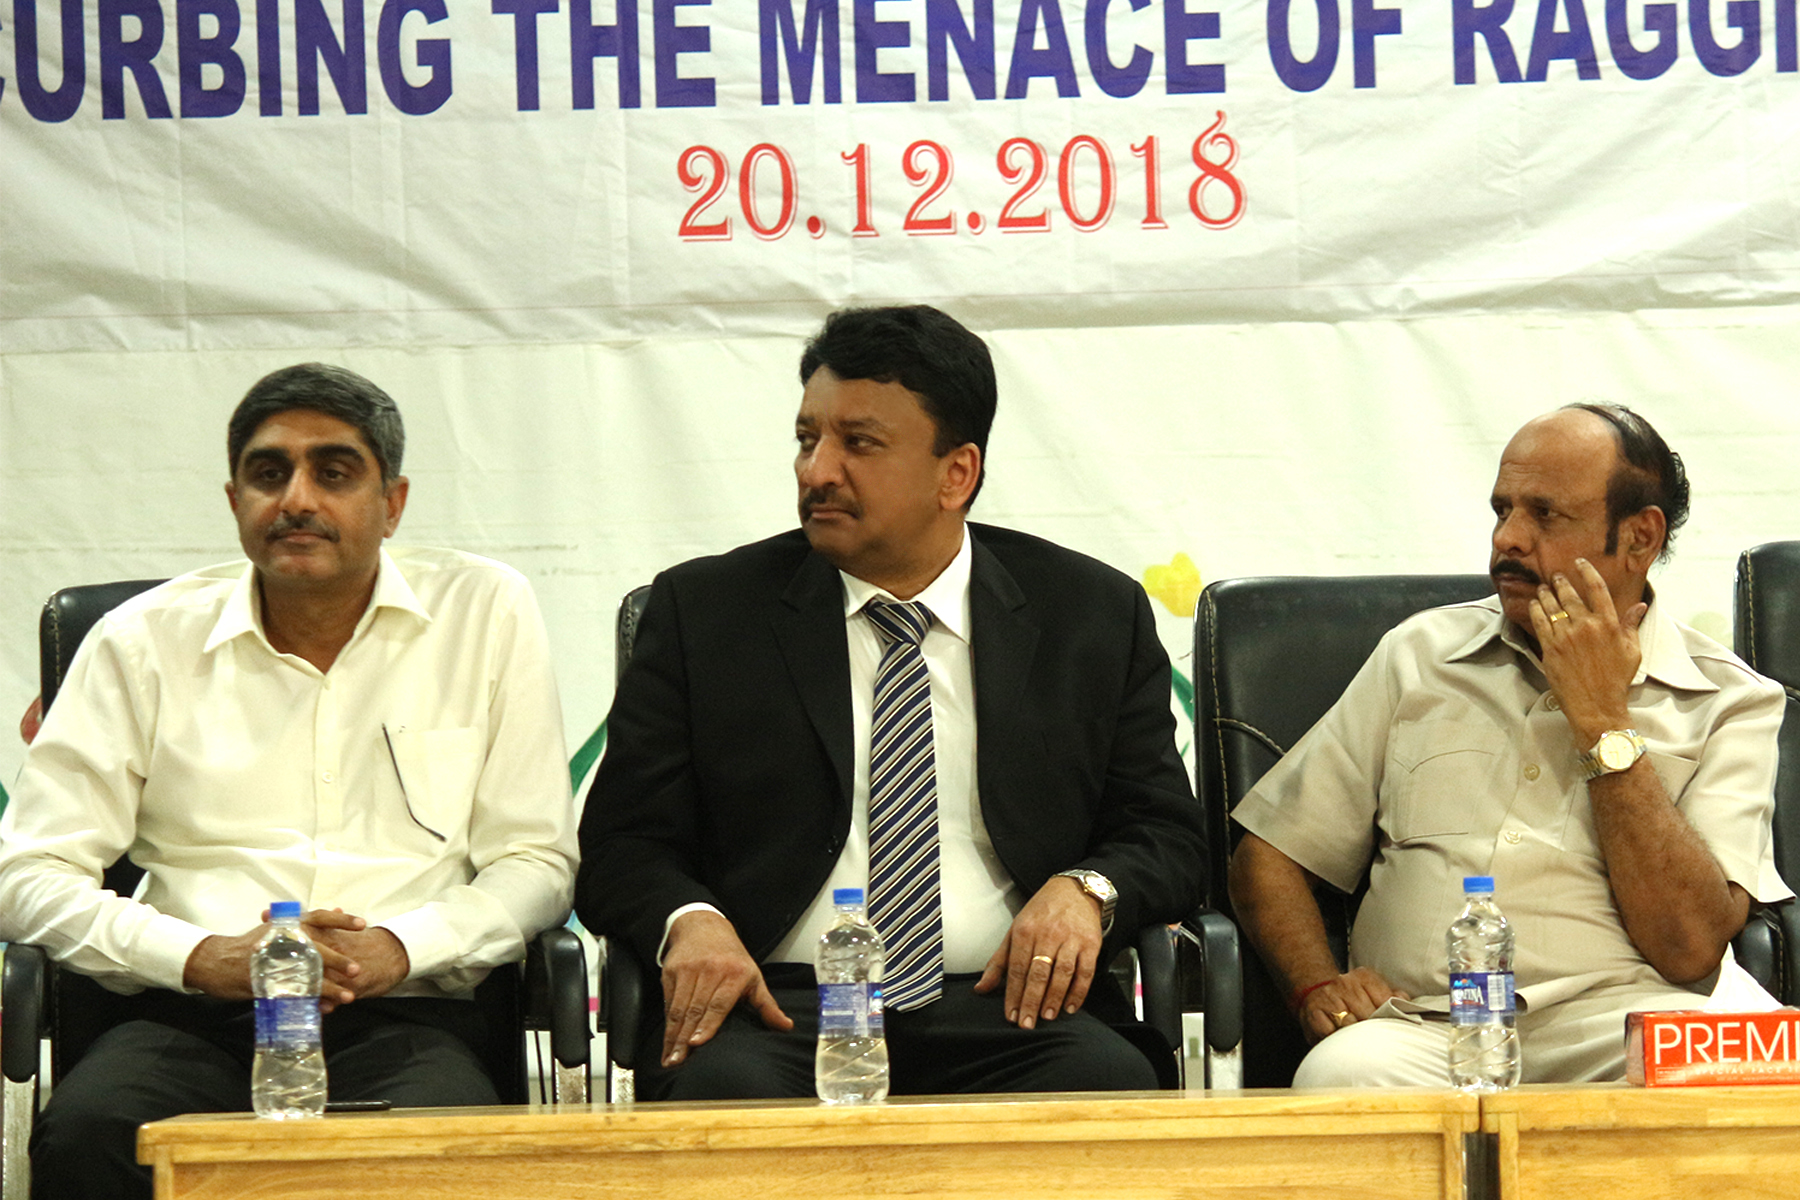 Prof Sm Balaji On The Dais With Prof V Rangarajan